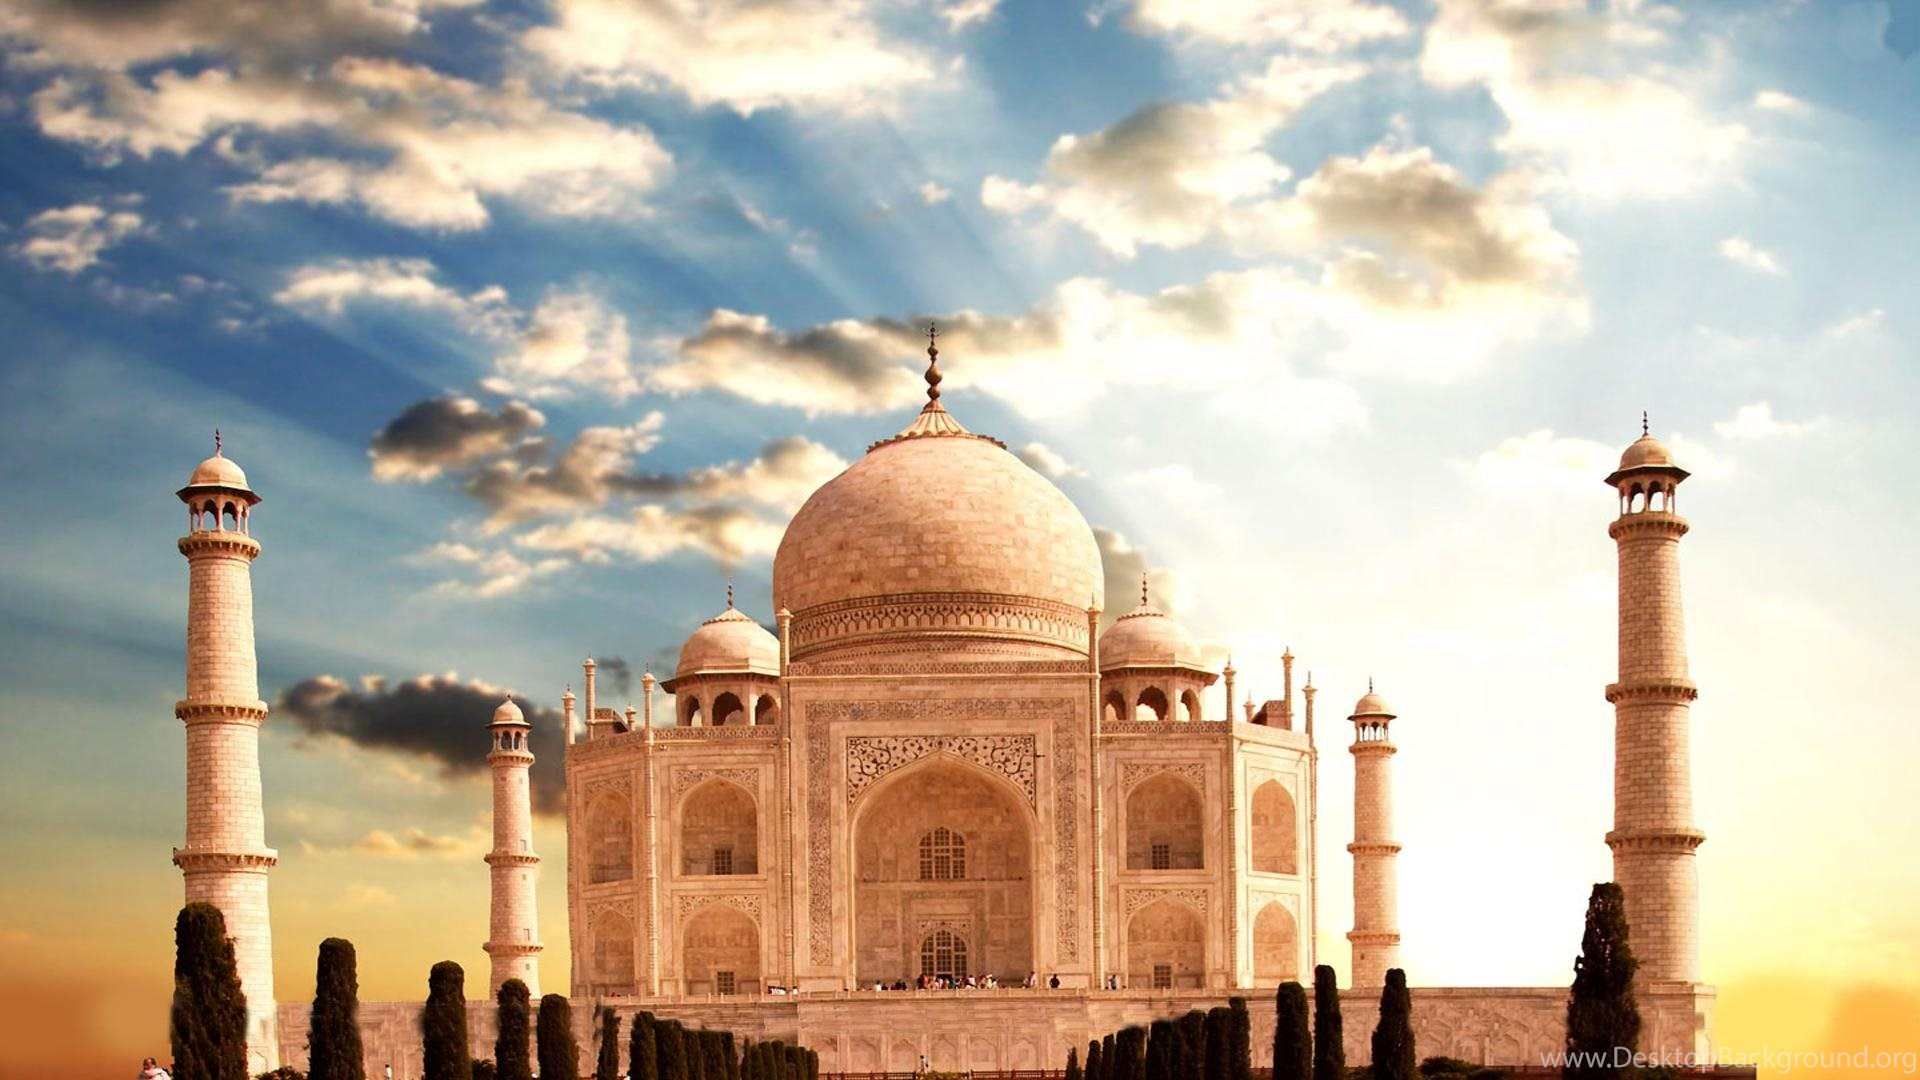 Taj Mahal Wallpapers Full Size Night Wallpaper Desktop Background